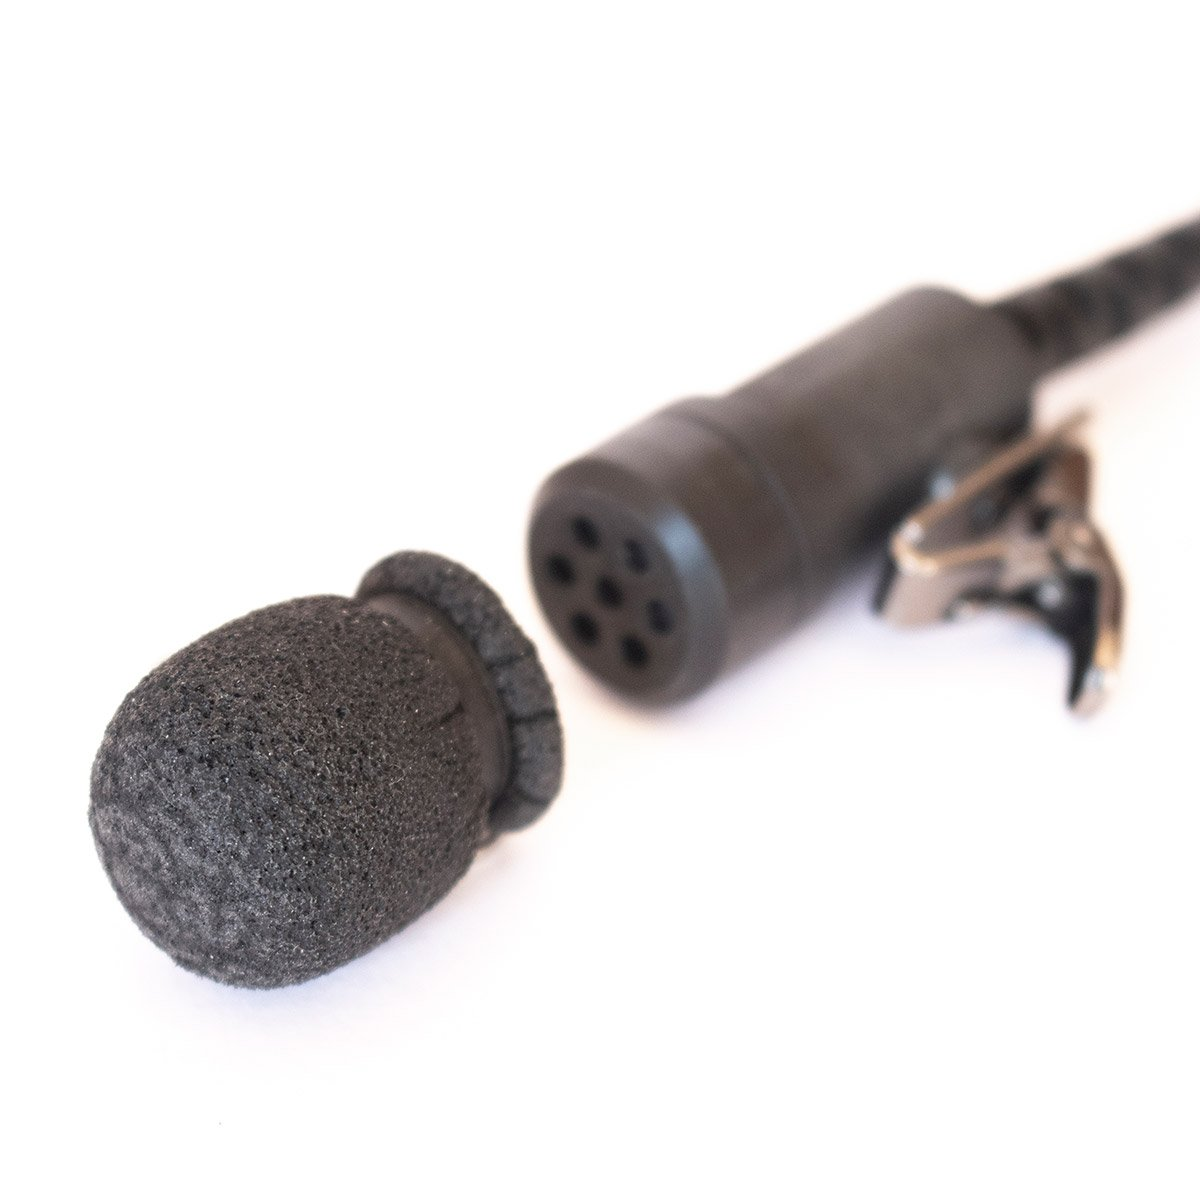 Listen Ear™ external microphone windsock accessory